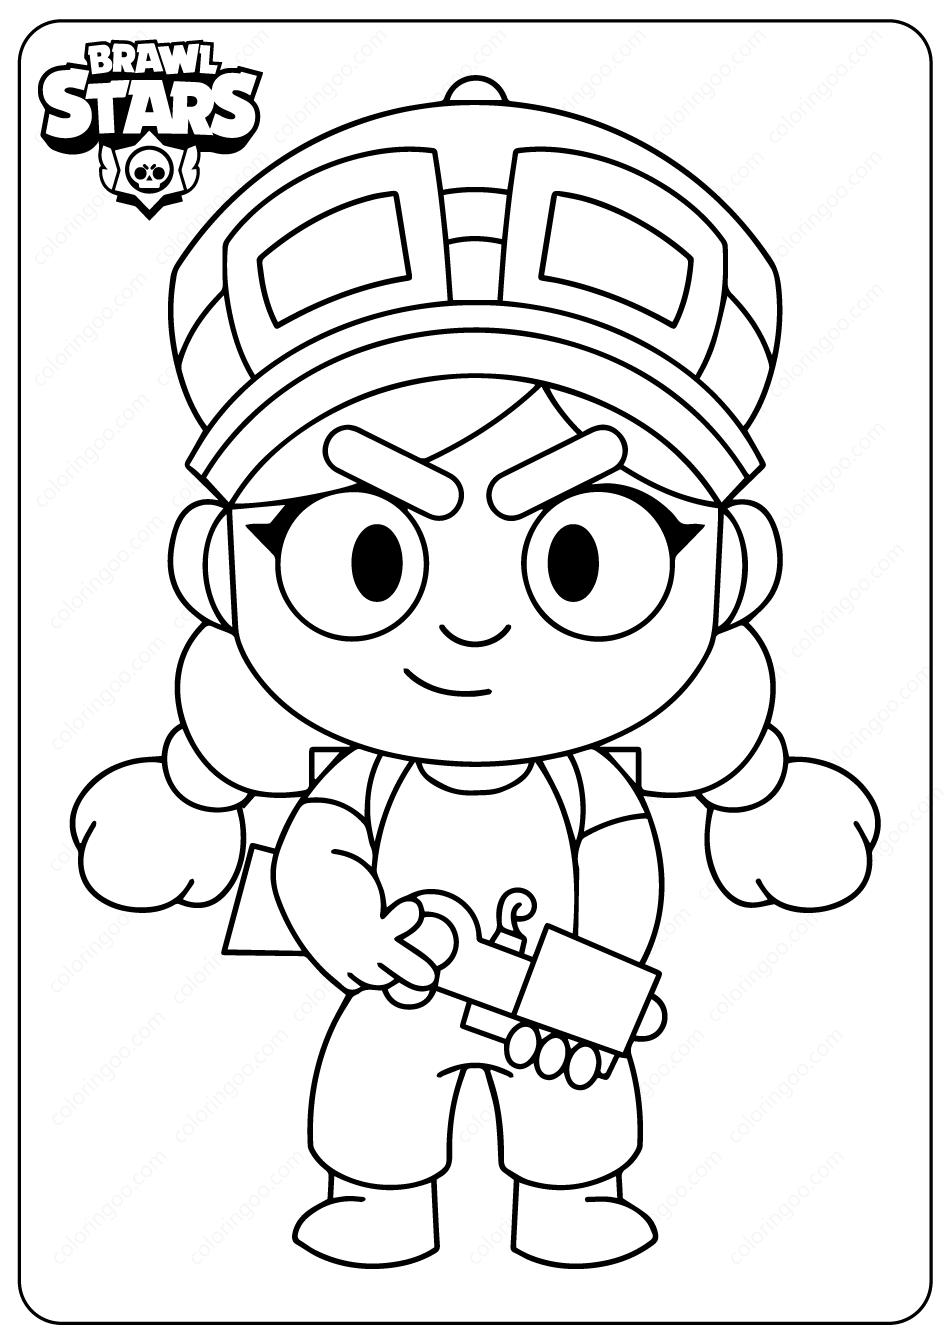 Printable Brawl Stars (Jessie) PDF Coloring Pages, 2020